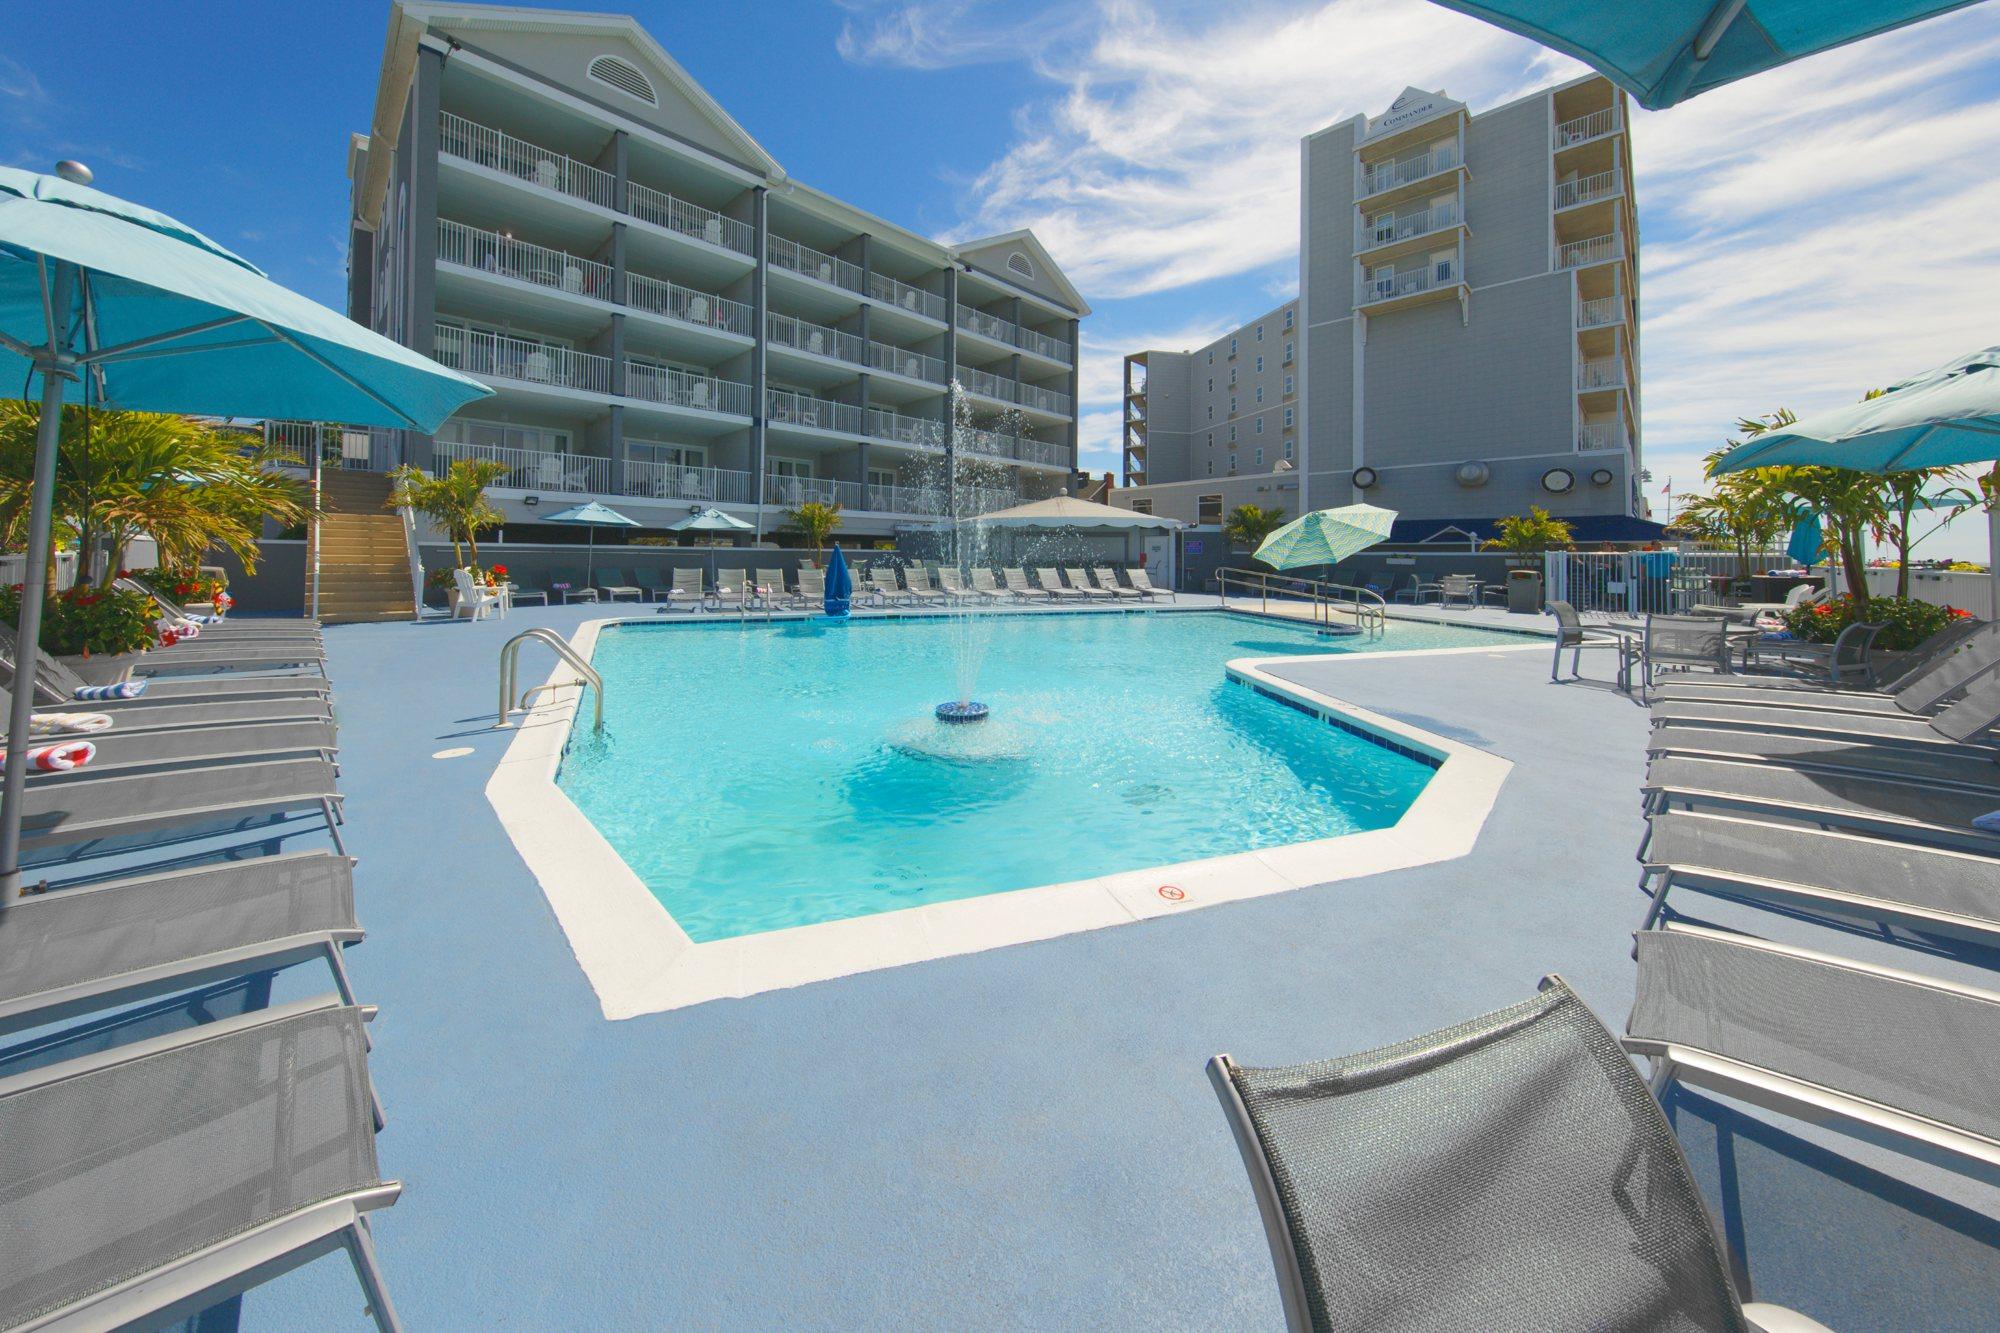 Commander Hotel Pool